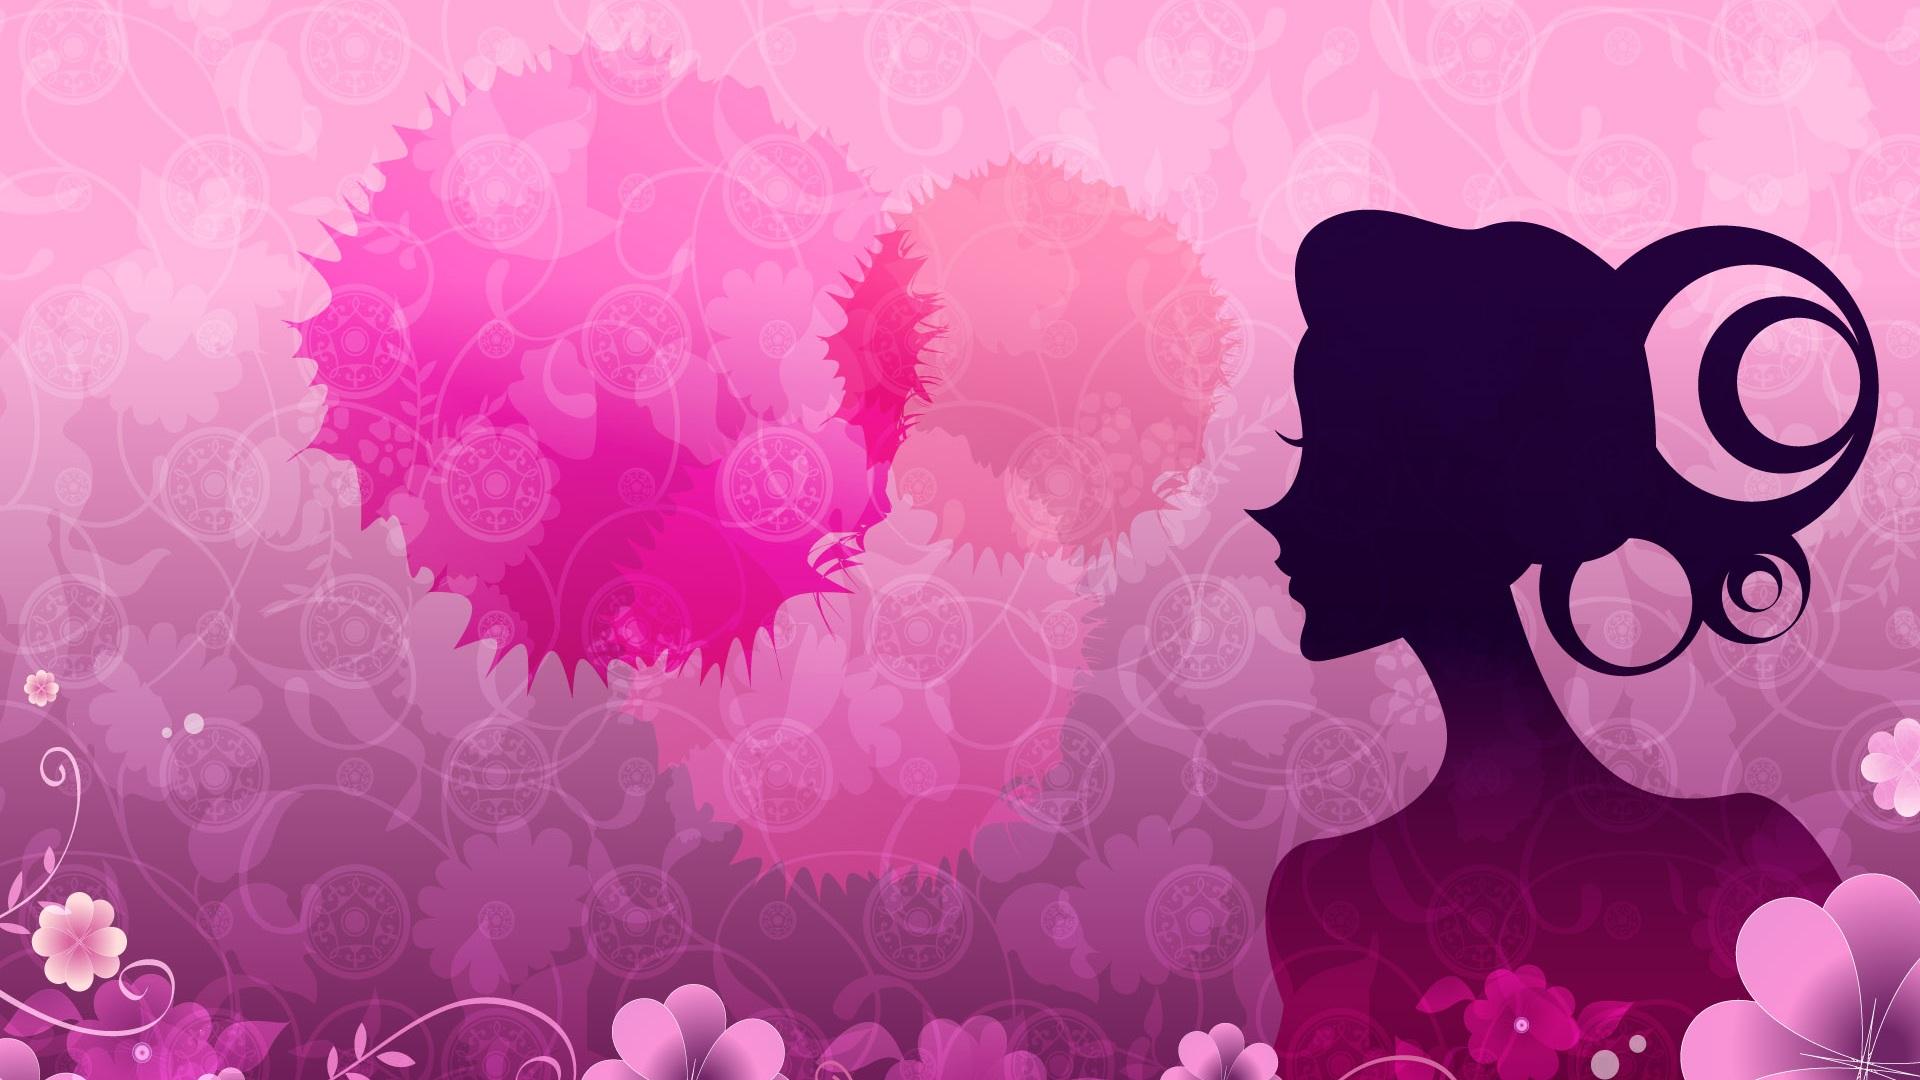 Girly Wallpapers Desktop Image 1920x1080